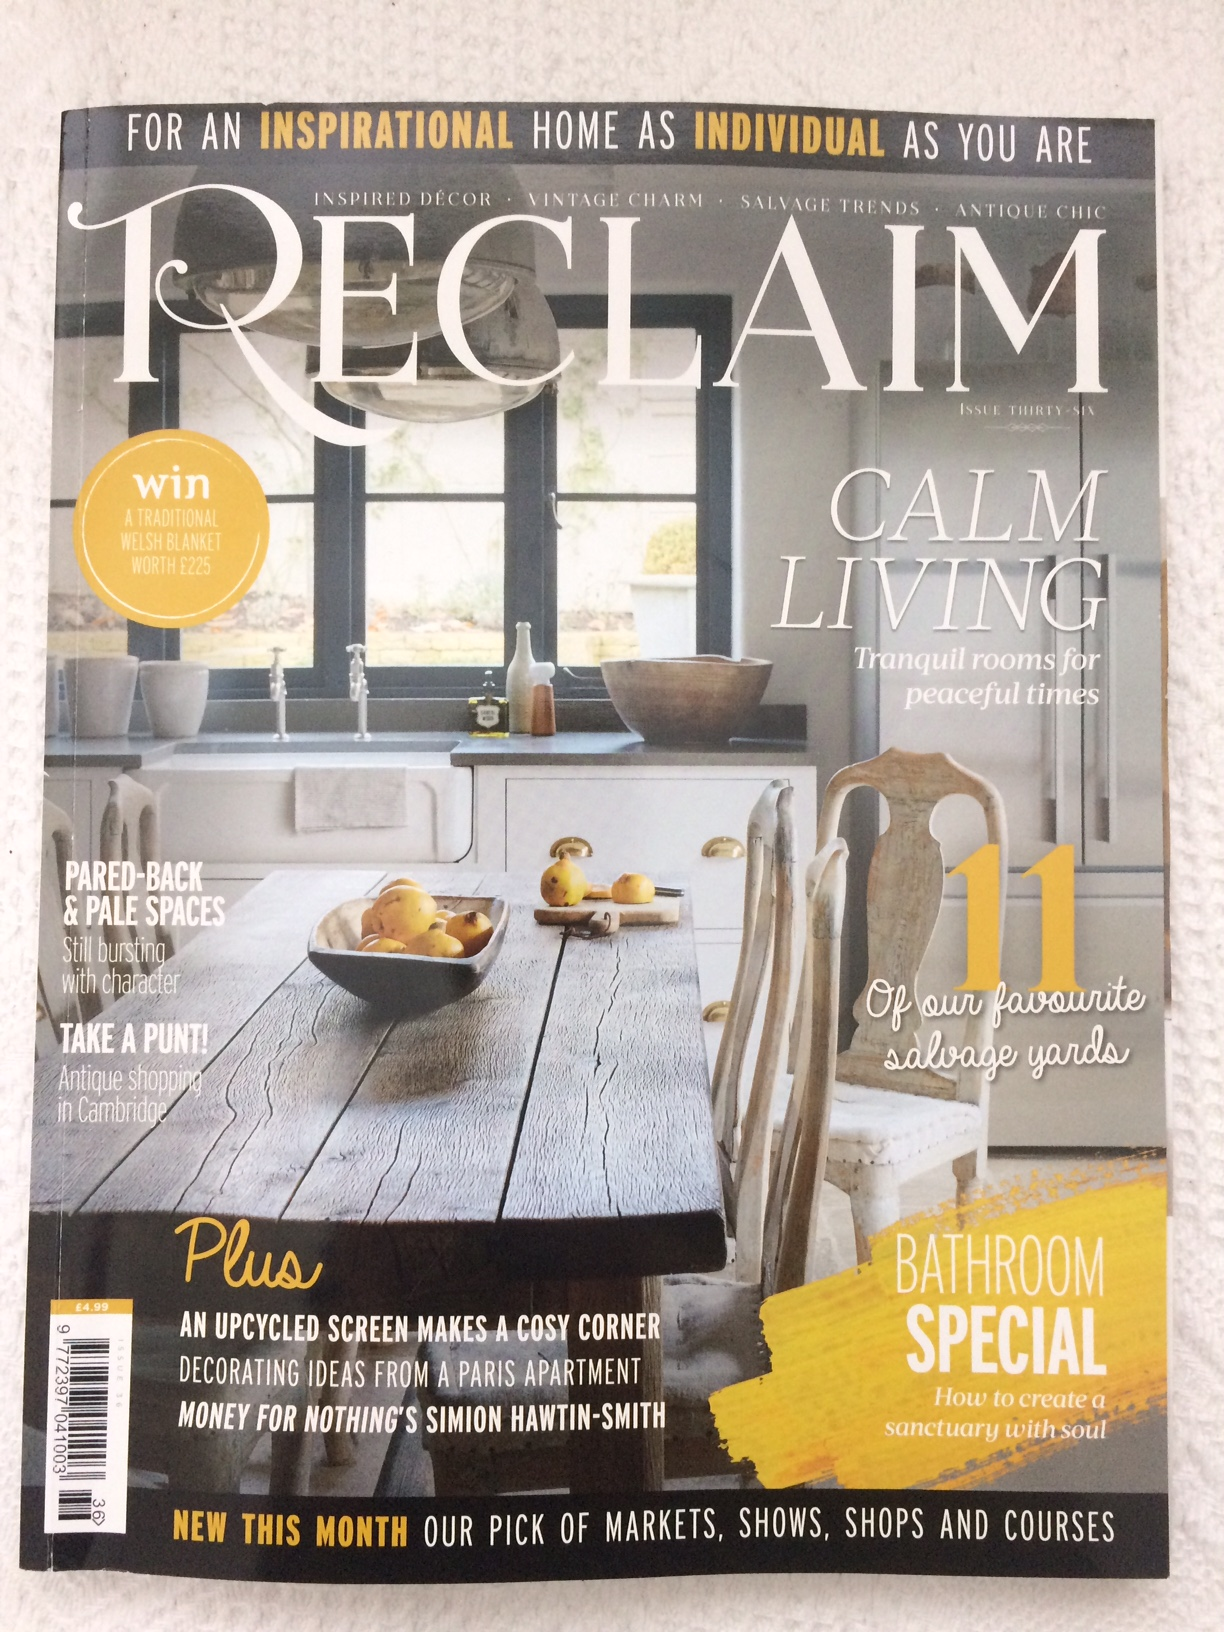 Reclaim-magazine-cover-march-2019.jpg